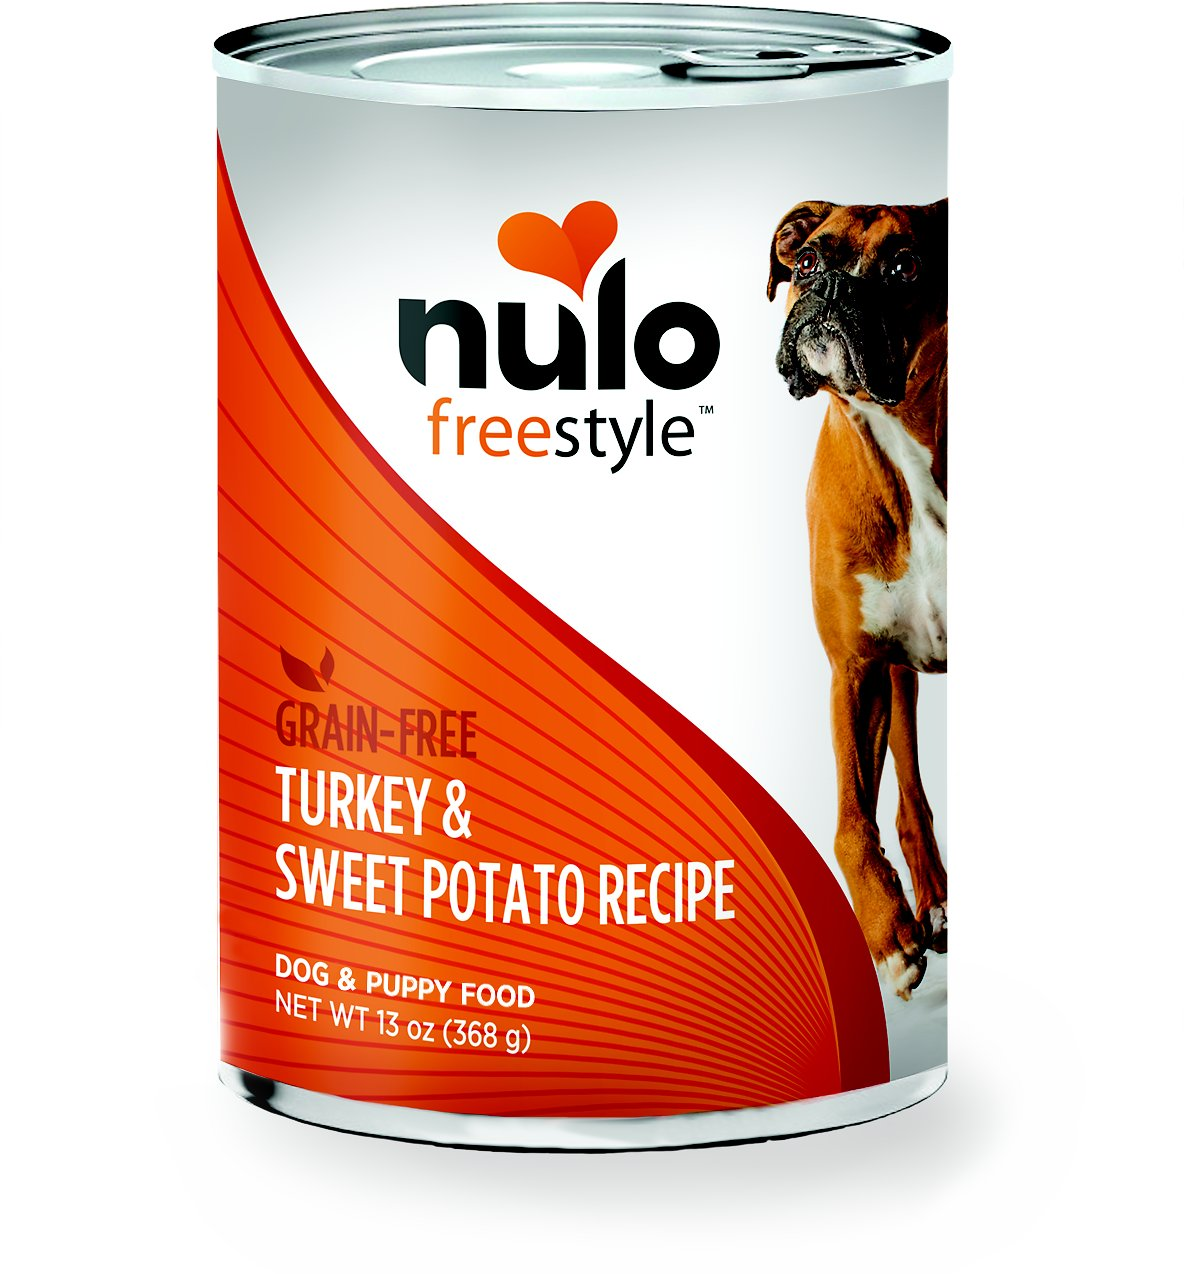 Nulo Dog Freestyle Pate Turkey & Sweet Potato Recipe Grain-Free Canned Dog Food, 13-oz